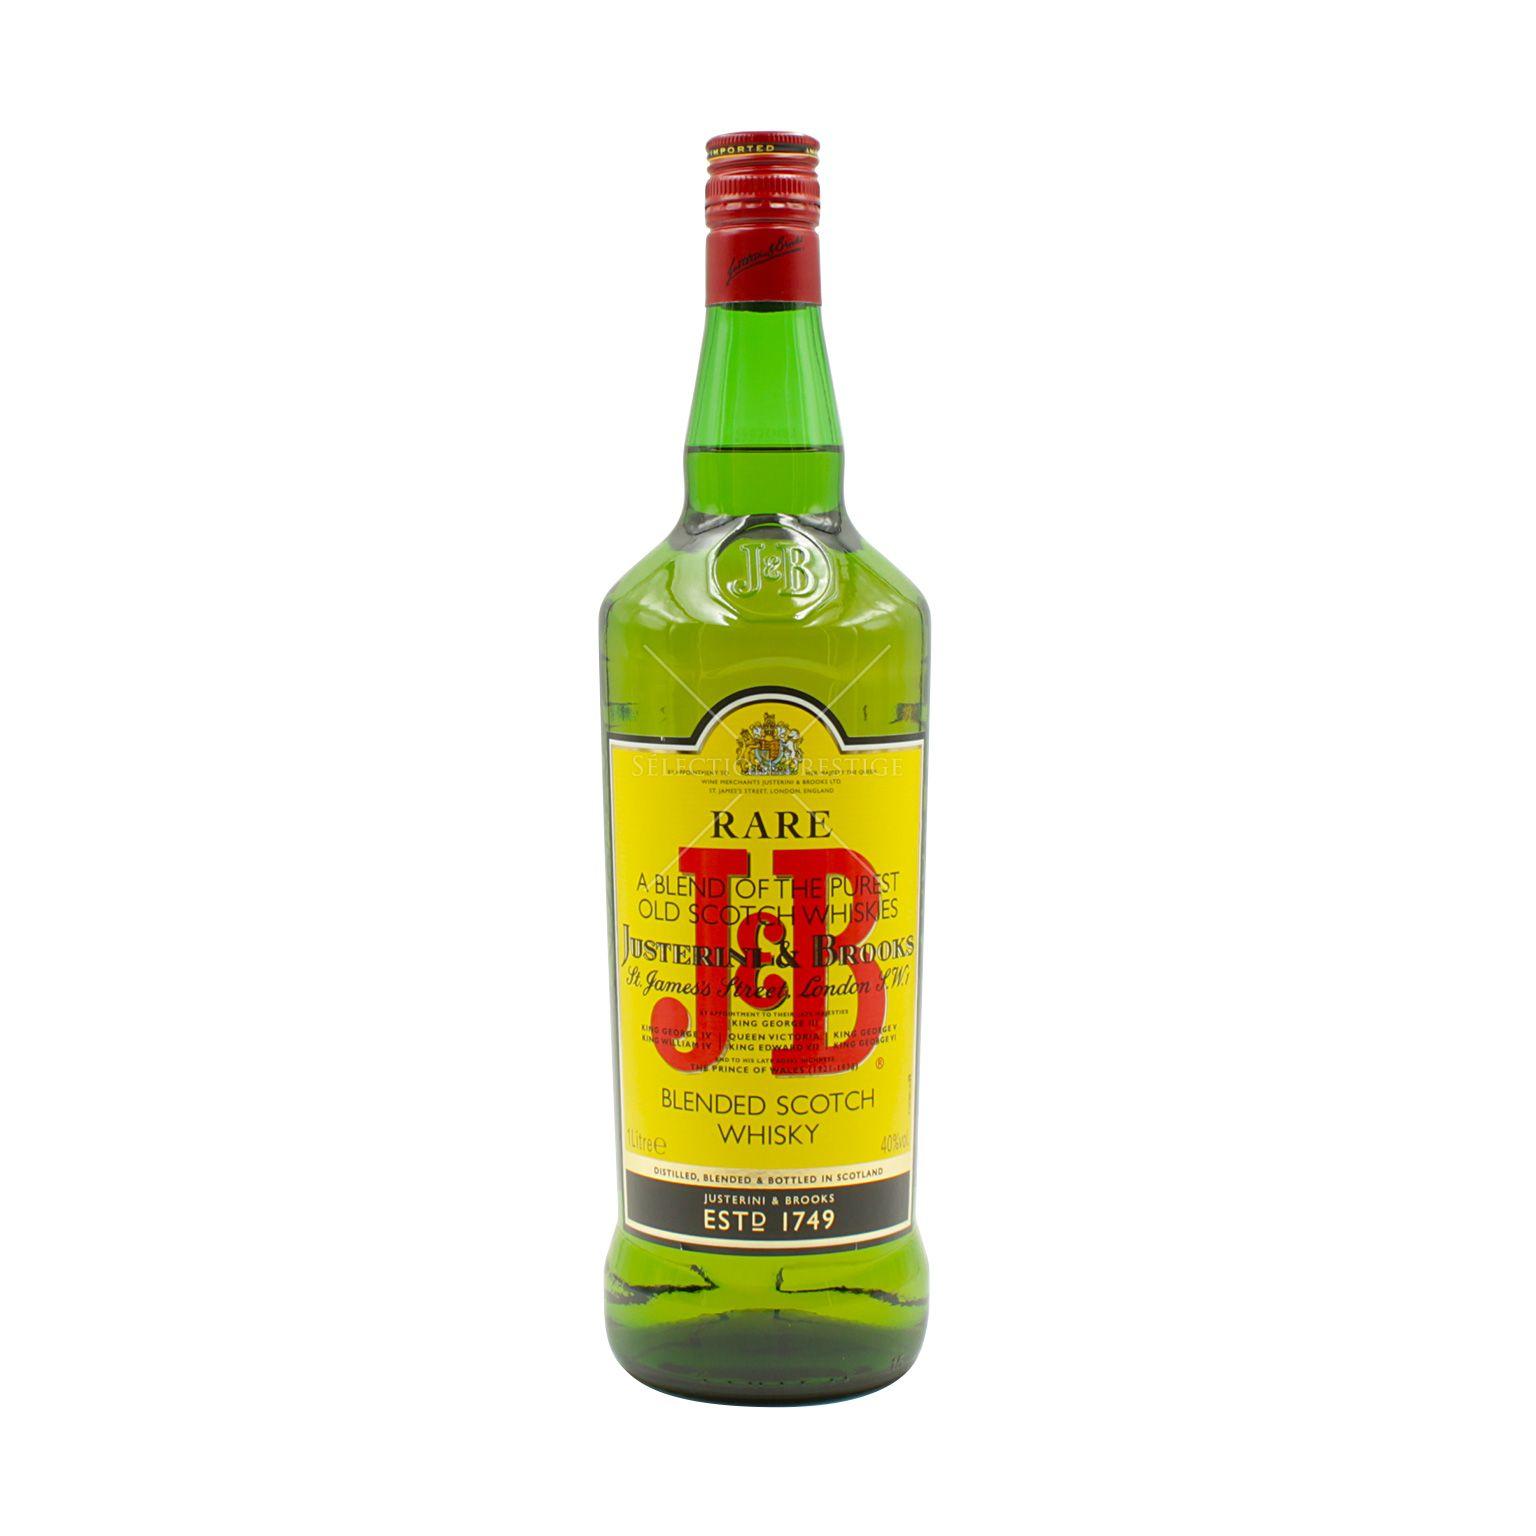 J & B Rare Blended Scotch Whisky 1L